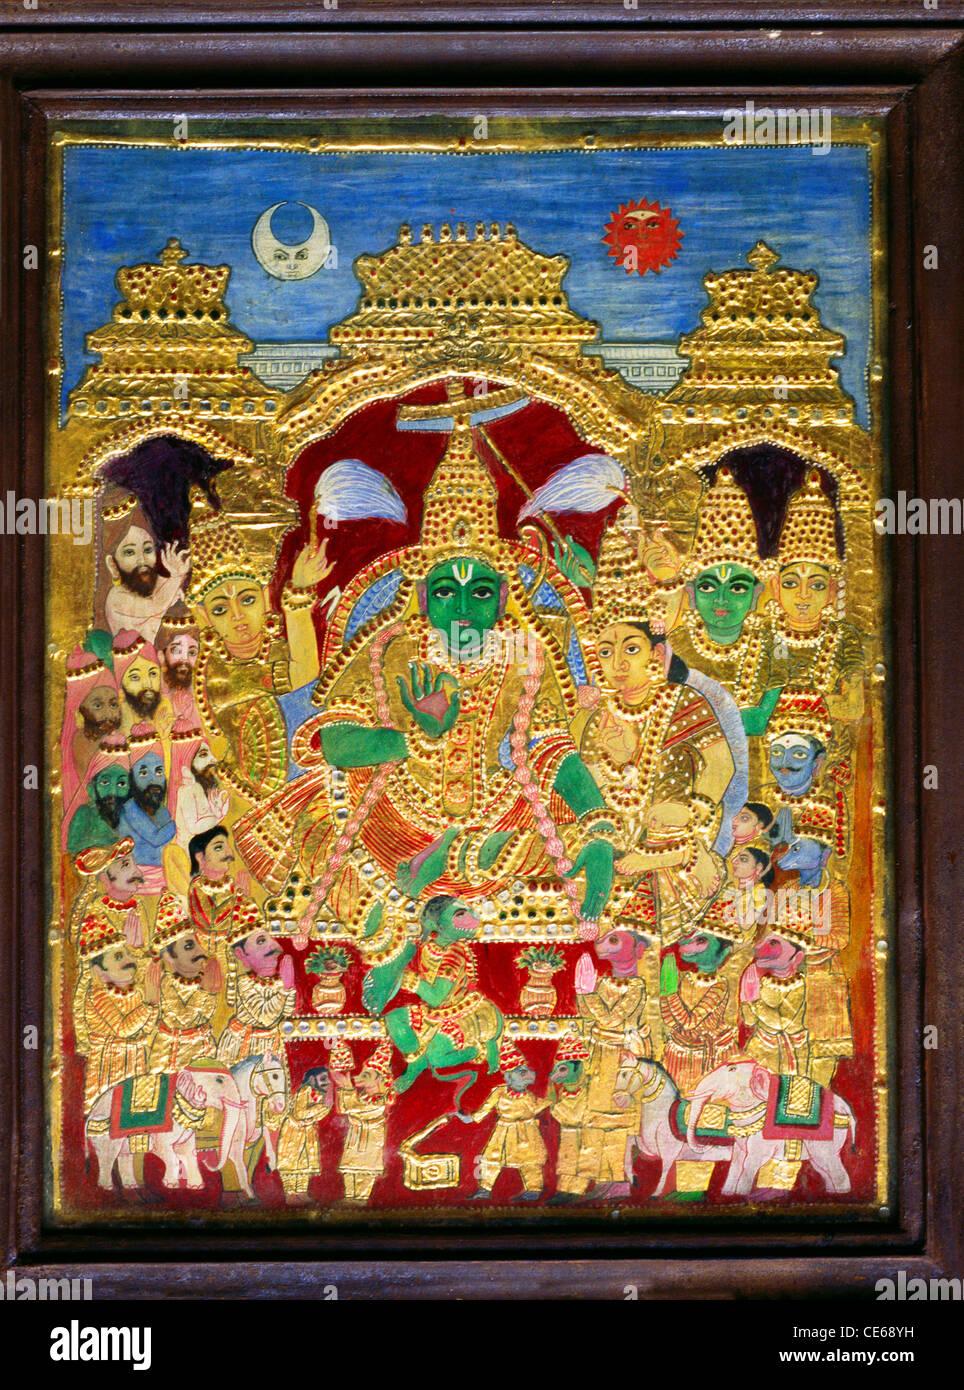 100 years old Thanjavur painting Sri Rama with Sita - Stock Image